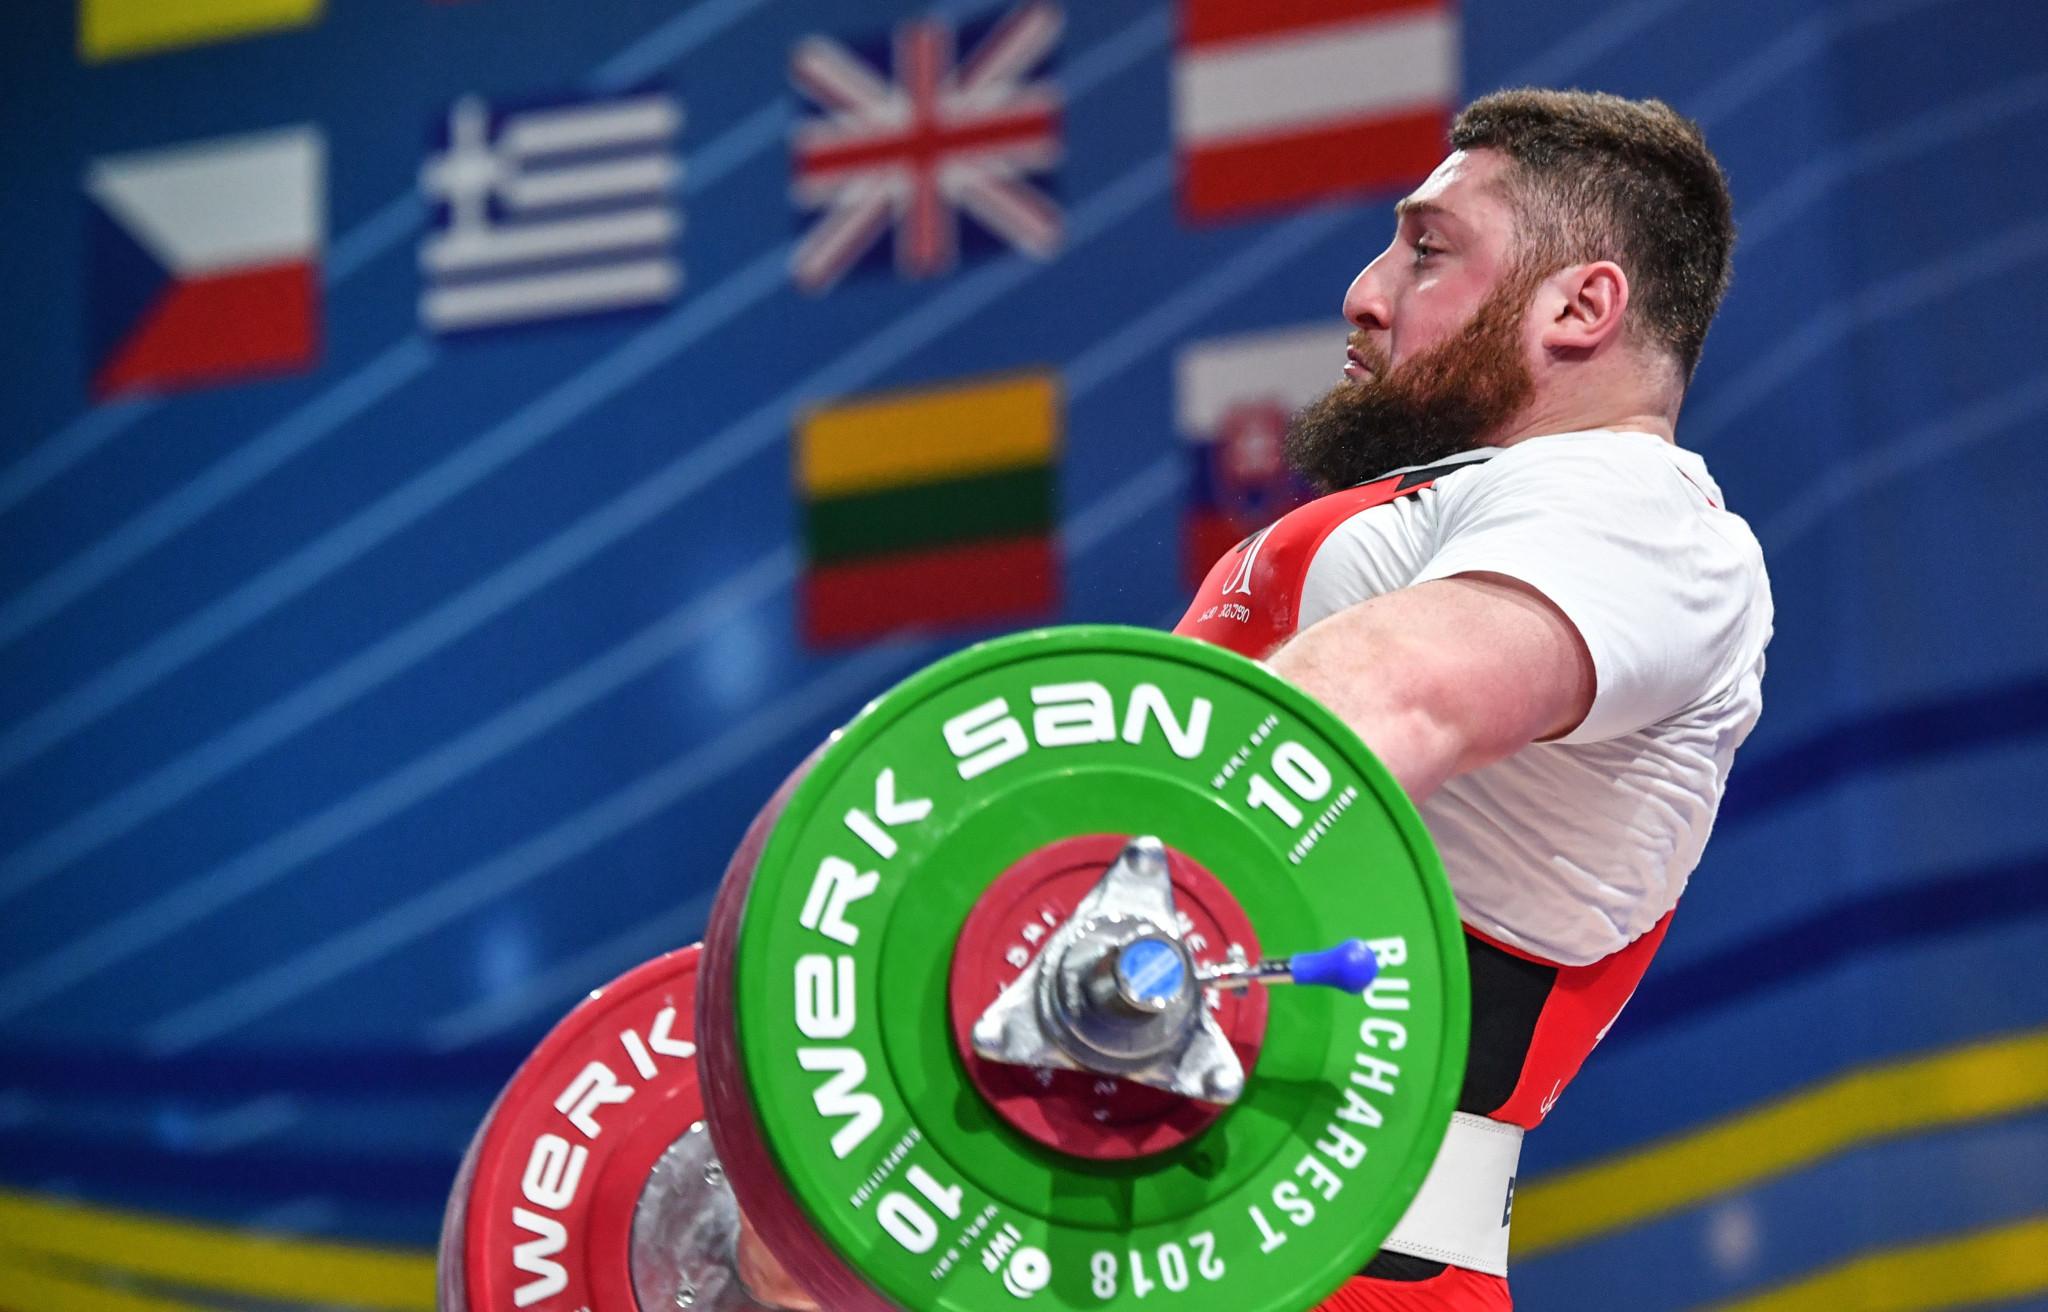 Lasha Talakhadze set three world records ©Getty Images